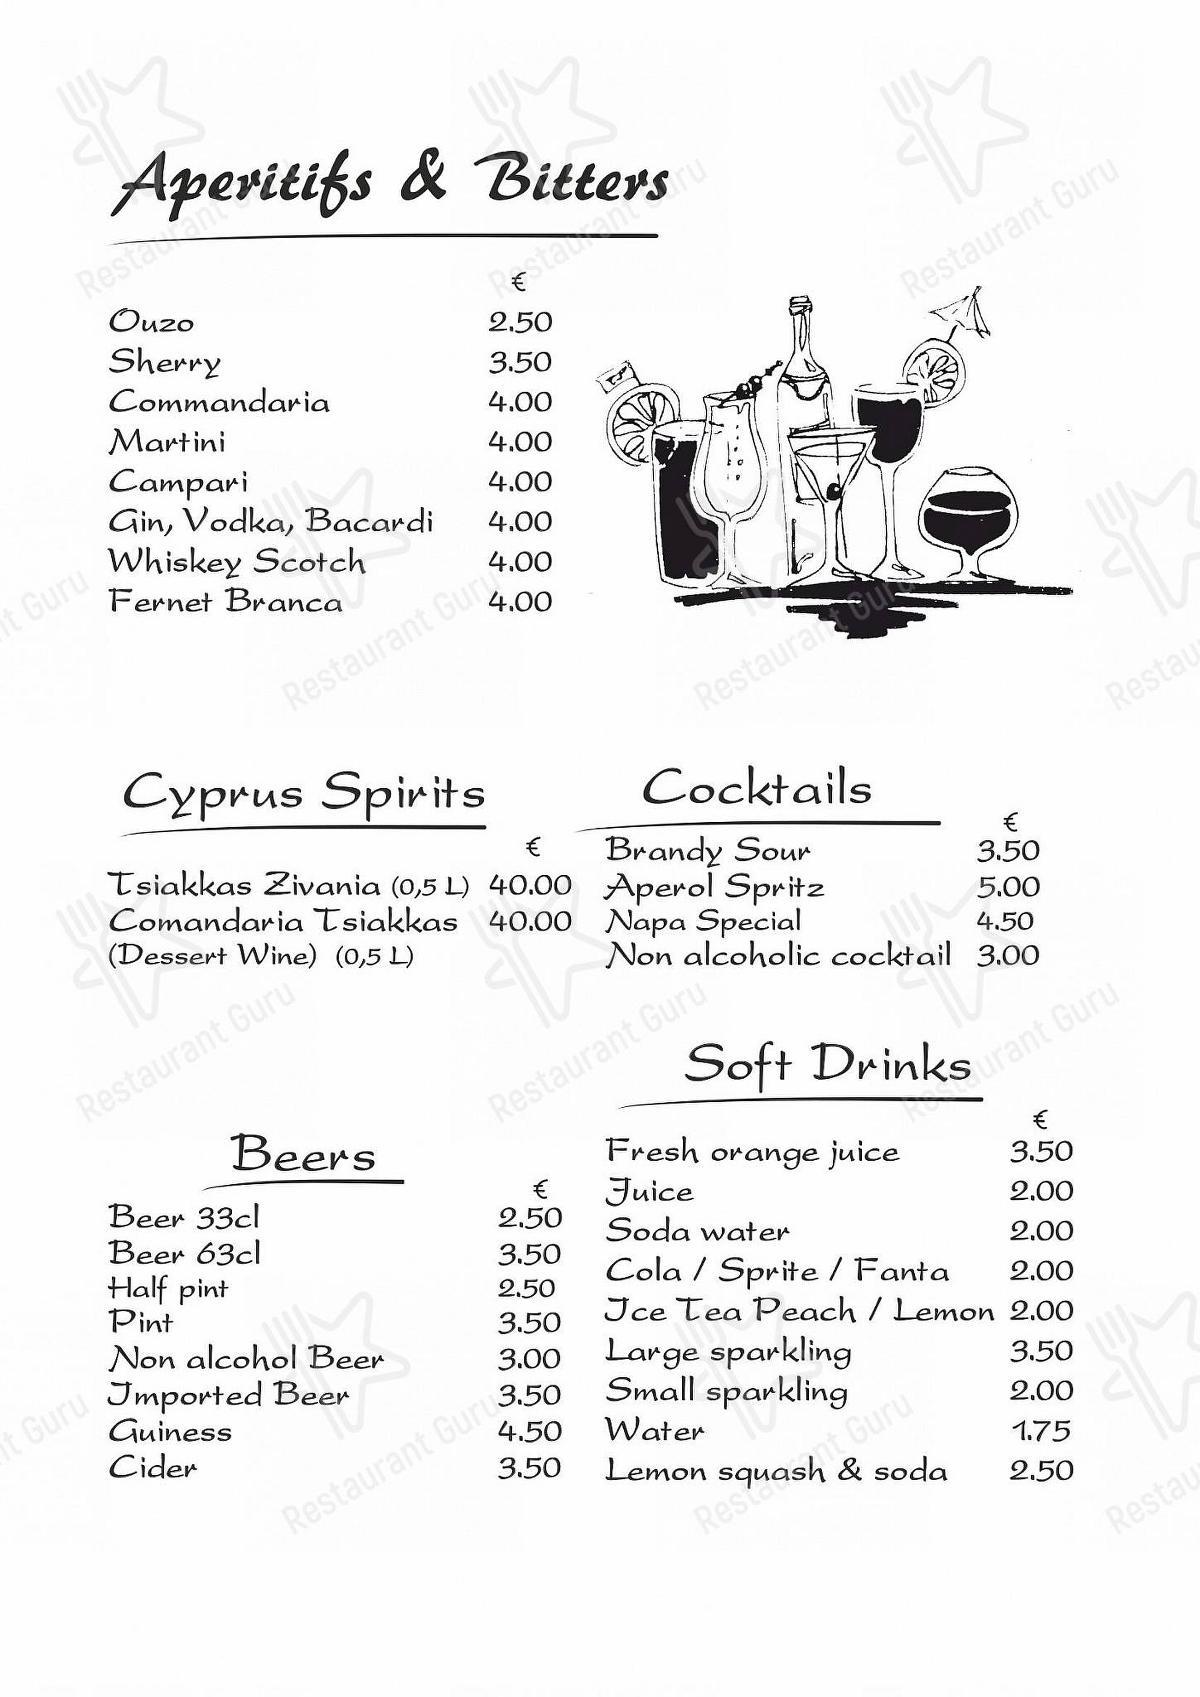 Menu for the Taverna Napa restaurant